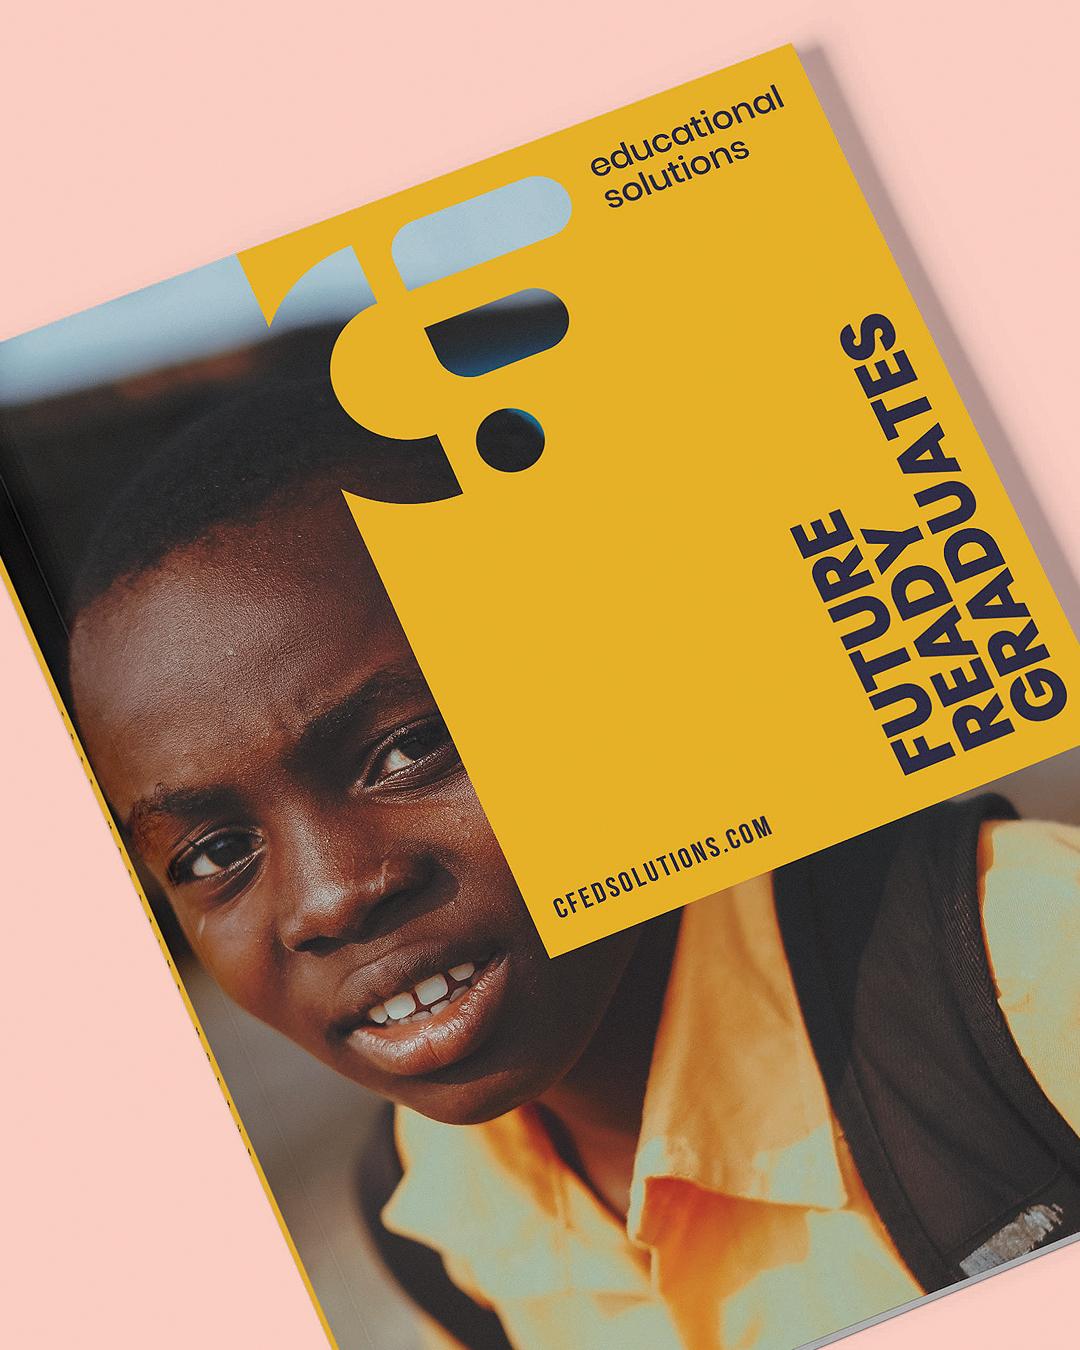 CF Educational Solutions - Brand / Digital